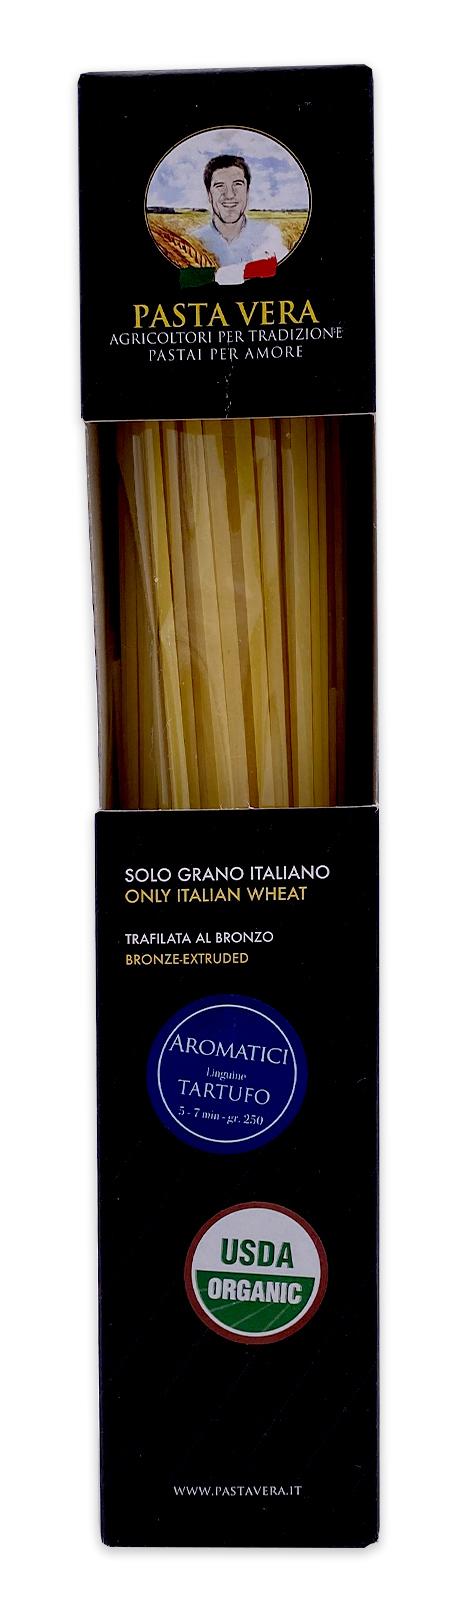 Pasta Vera Italian Organic Tartufo Truffle Linguine 02